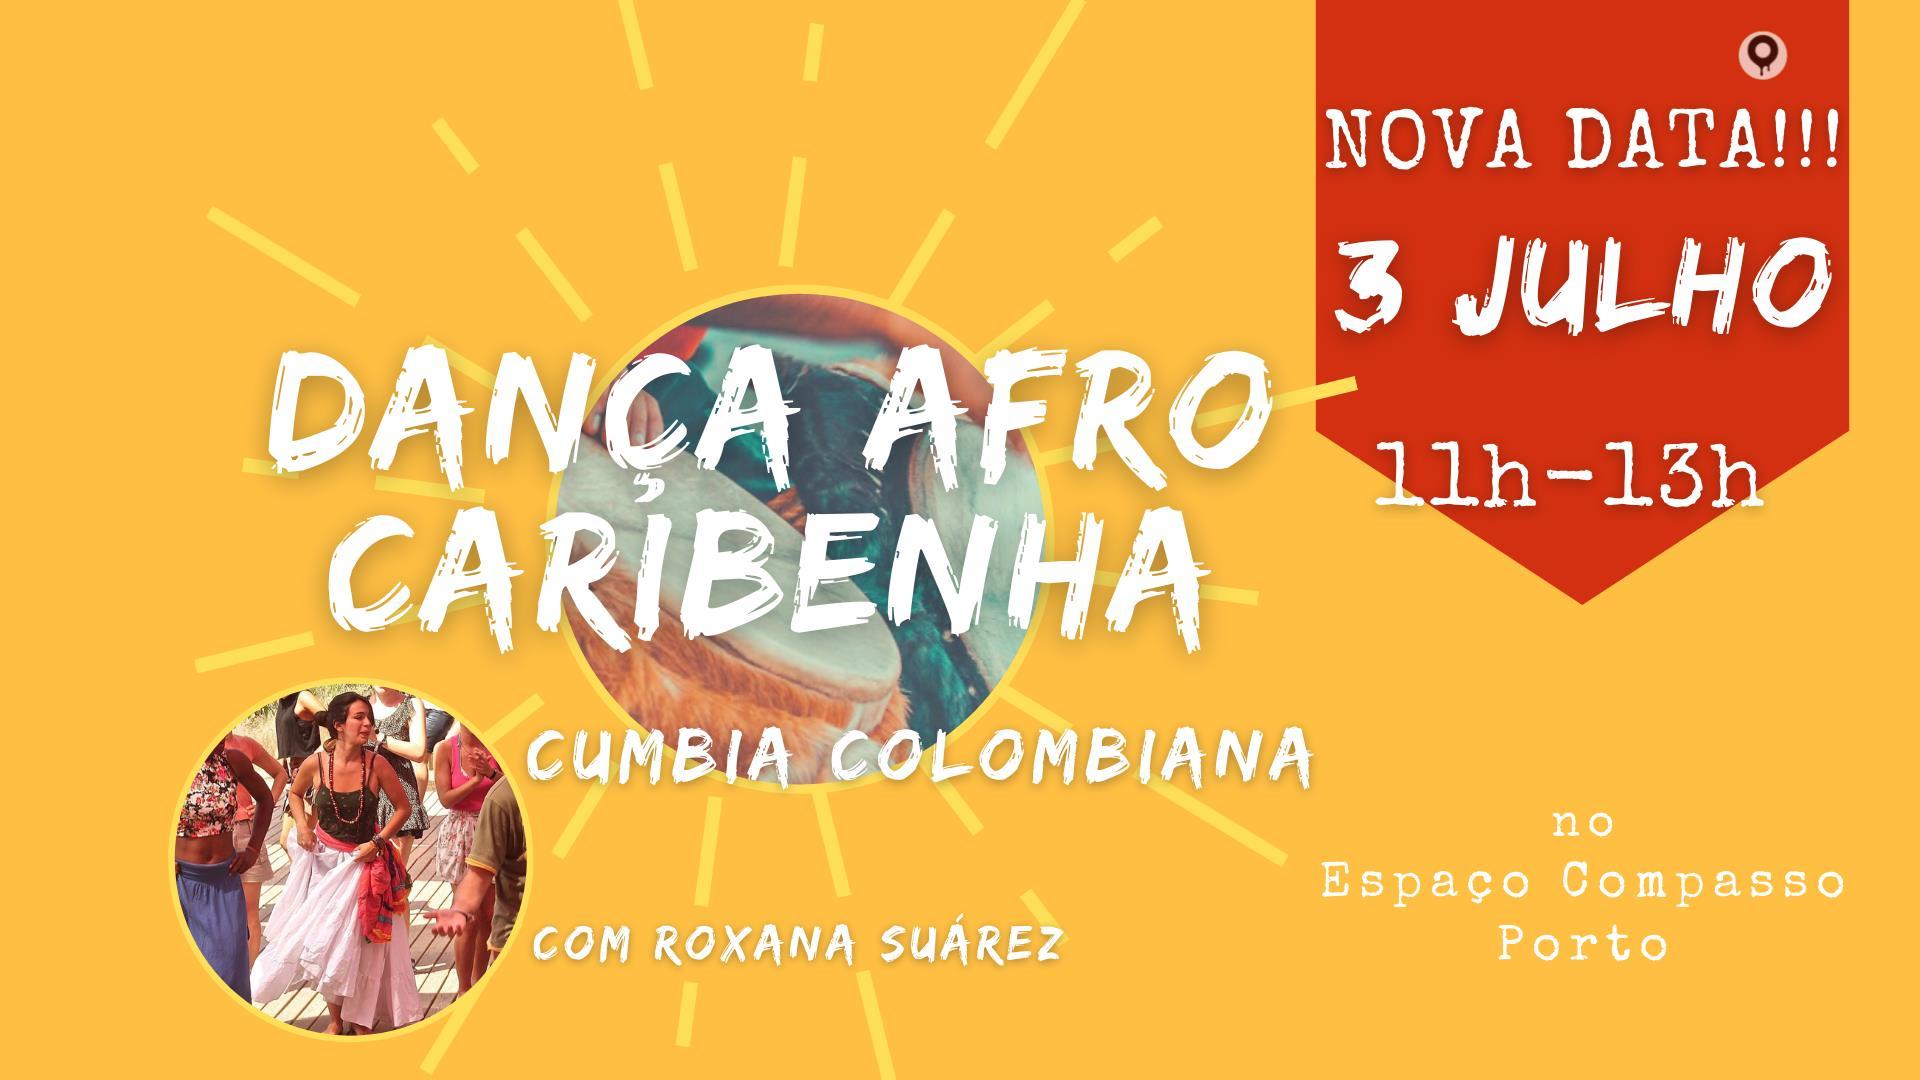 Dança AfroCaribenha - Cumbia Colombiana